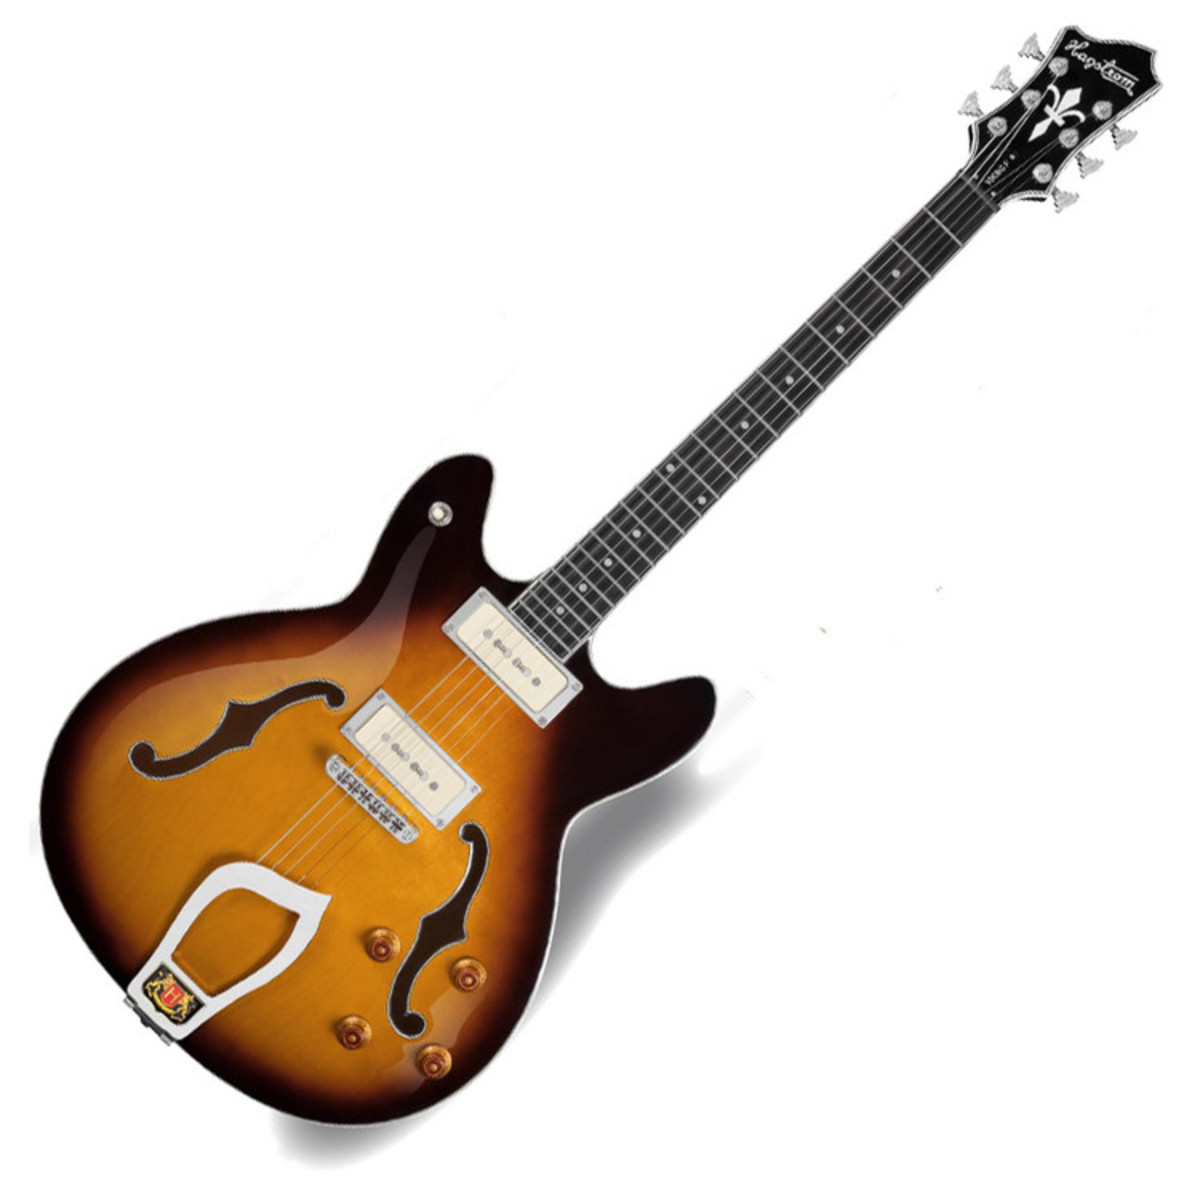 Hagstrom Viking P Semi Hollow Body Guitar  Tobacco